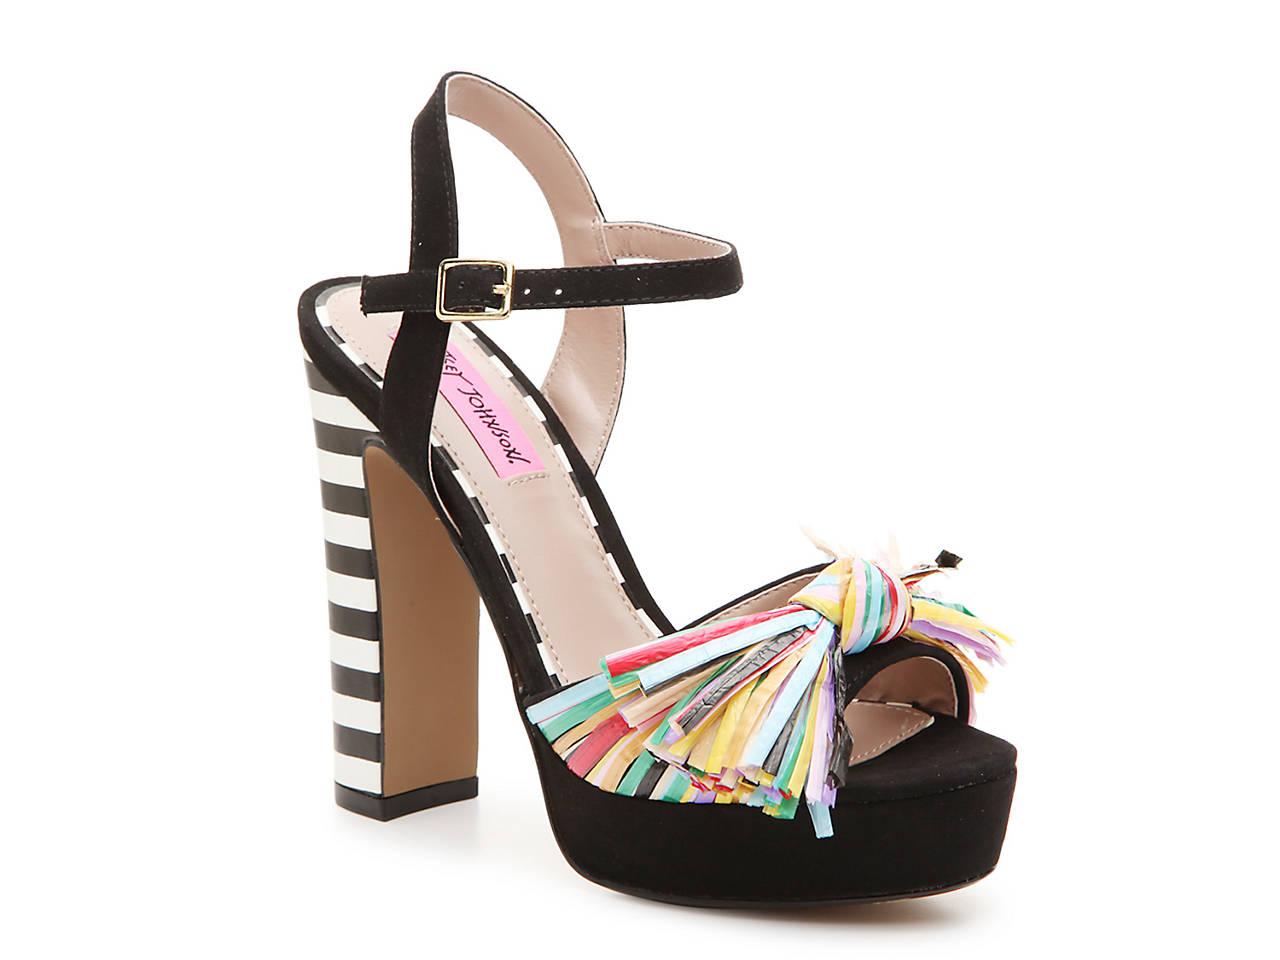 bef39b9a8cc Betsey Johnson Mandy Platform Sandal Women s Shoes